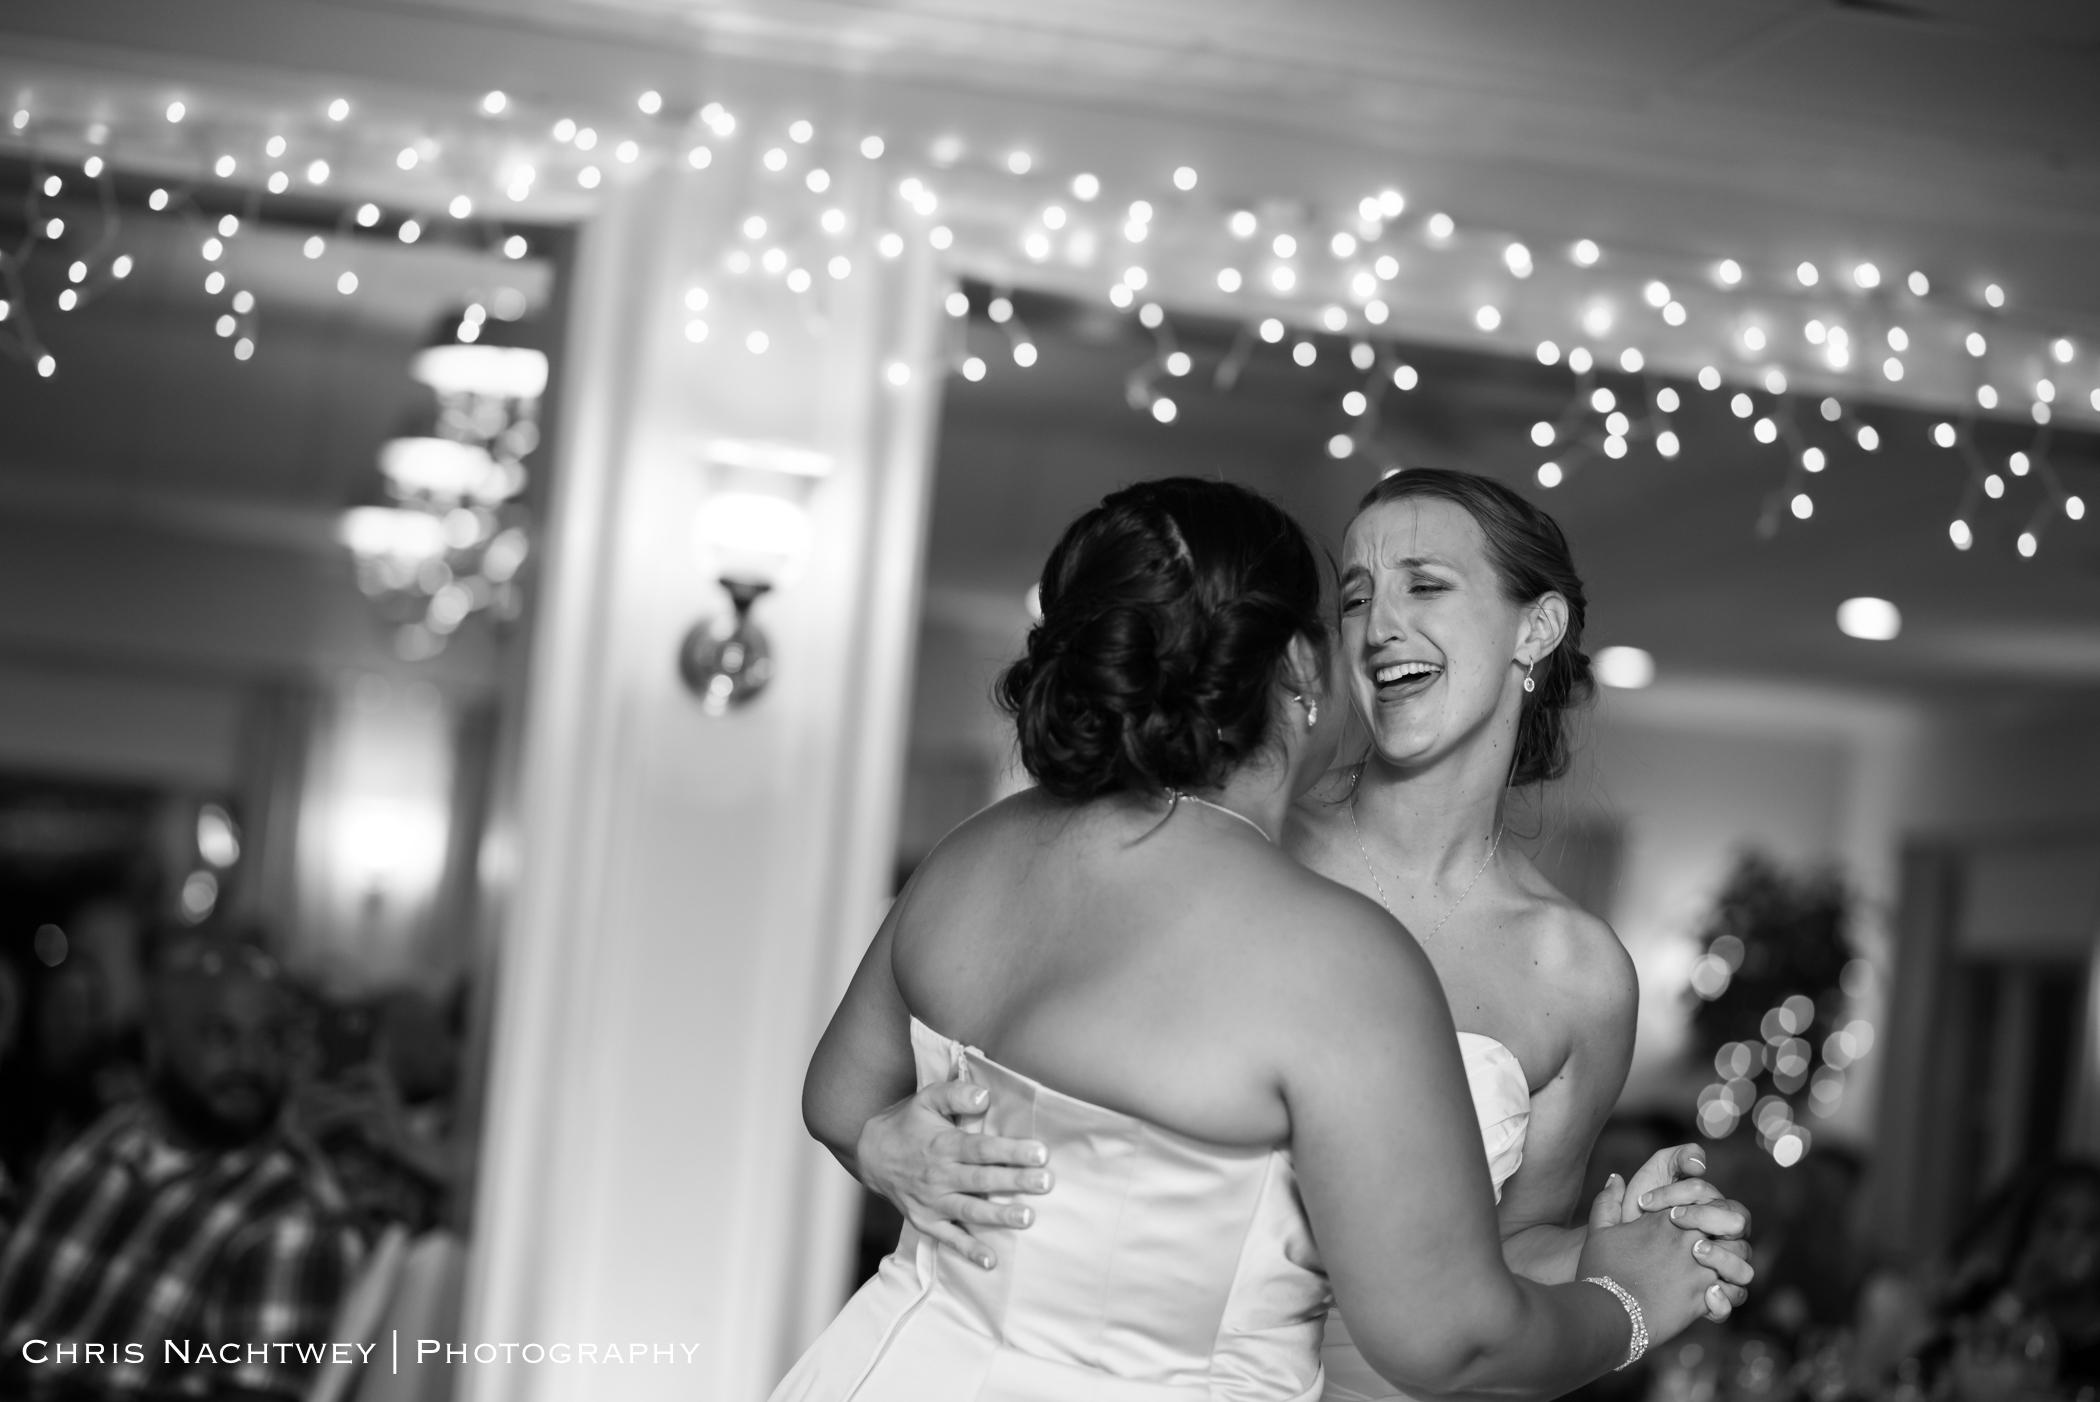 connecticut-same-sex-wedding-photographers-chris-nachtwey-2018-lisa-karina-32.jpg